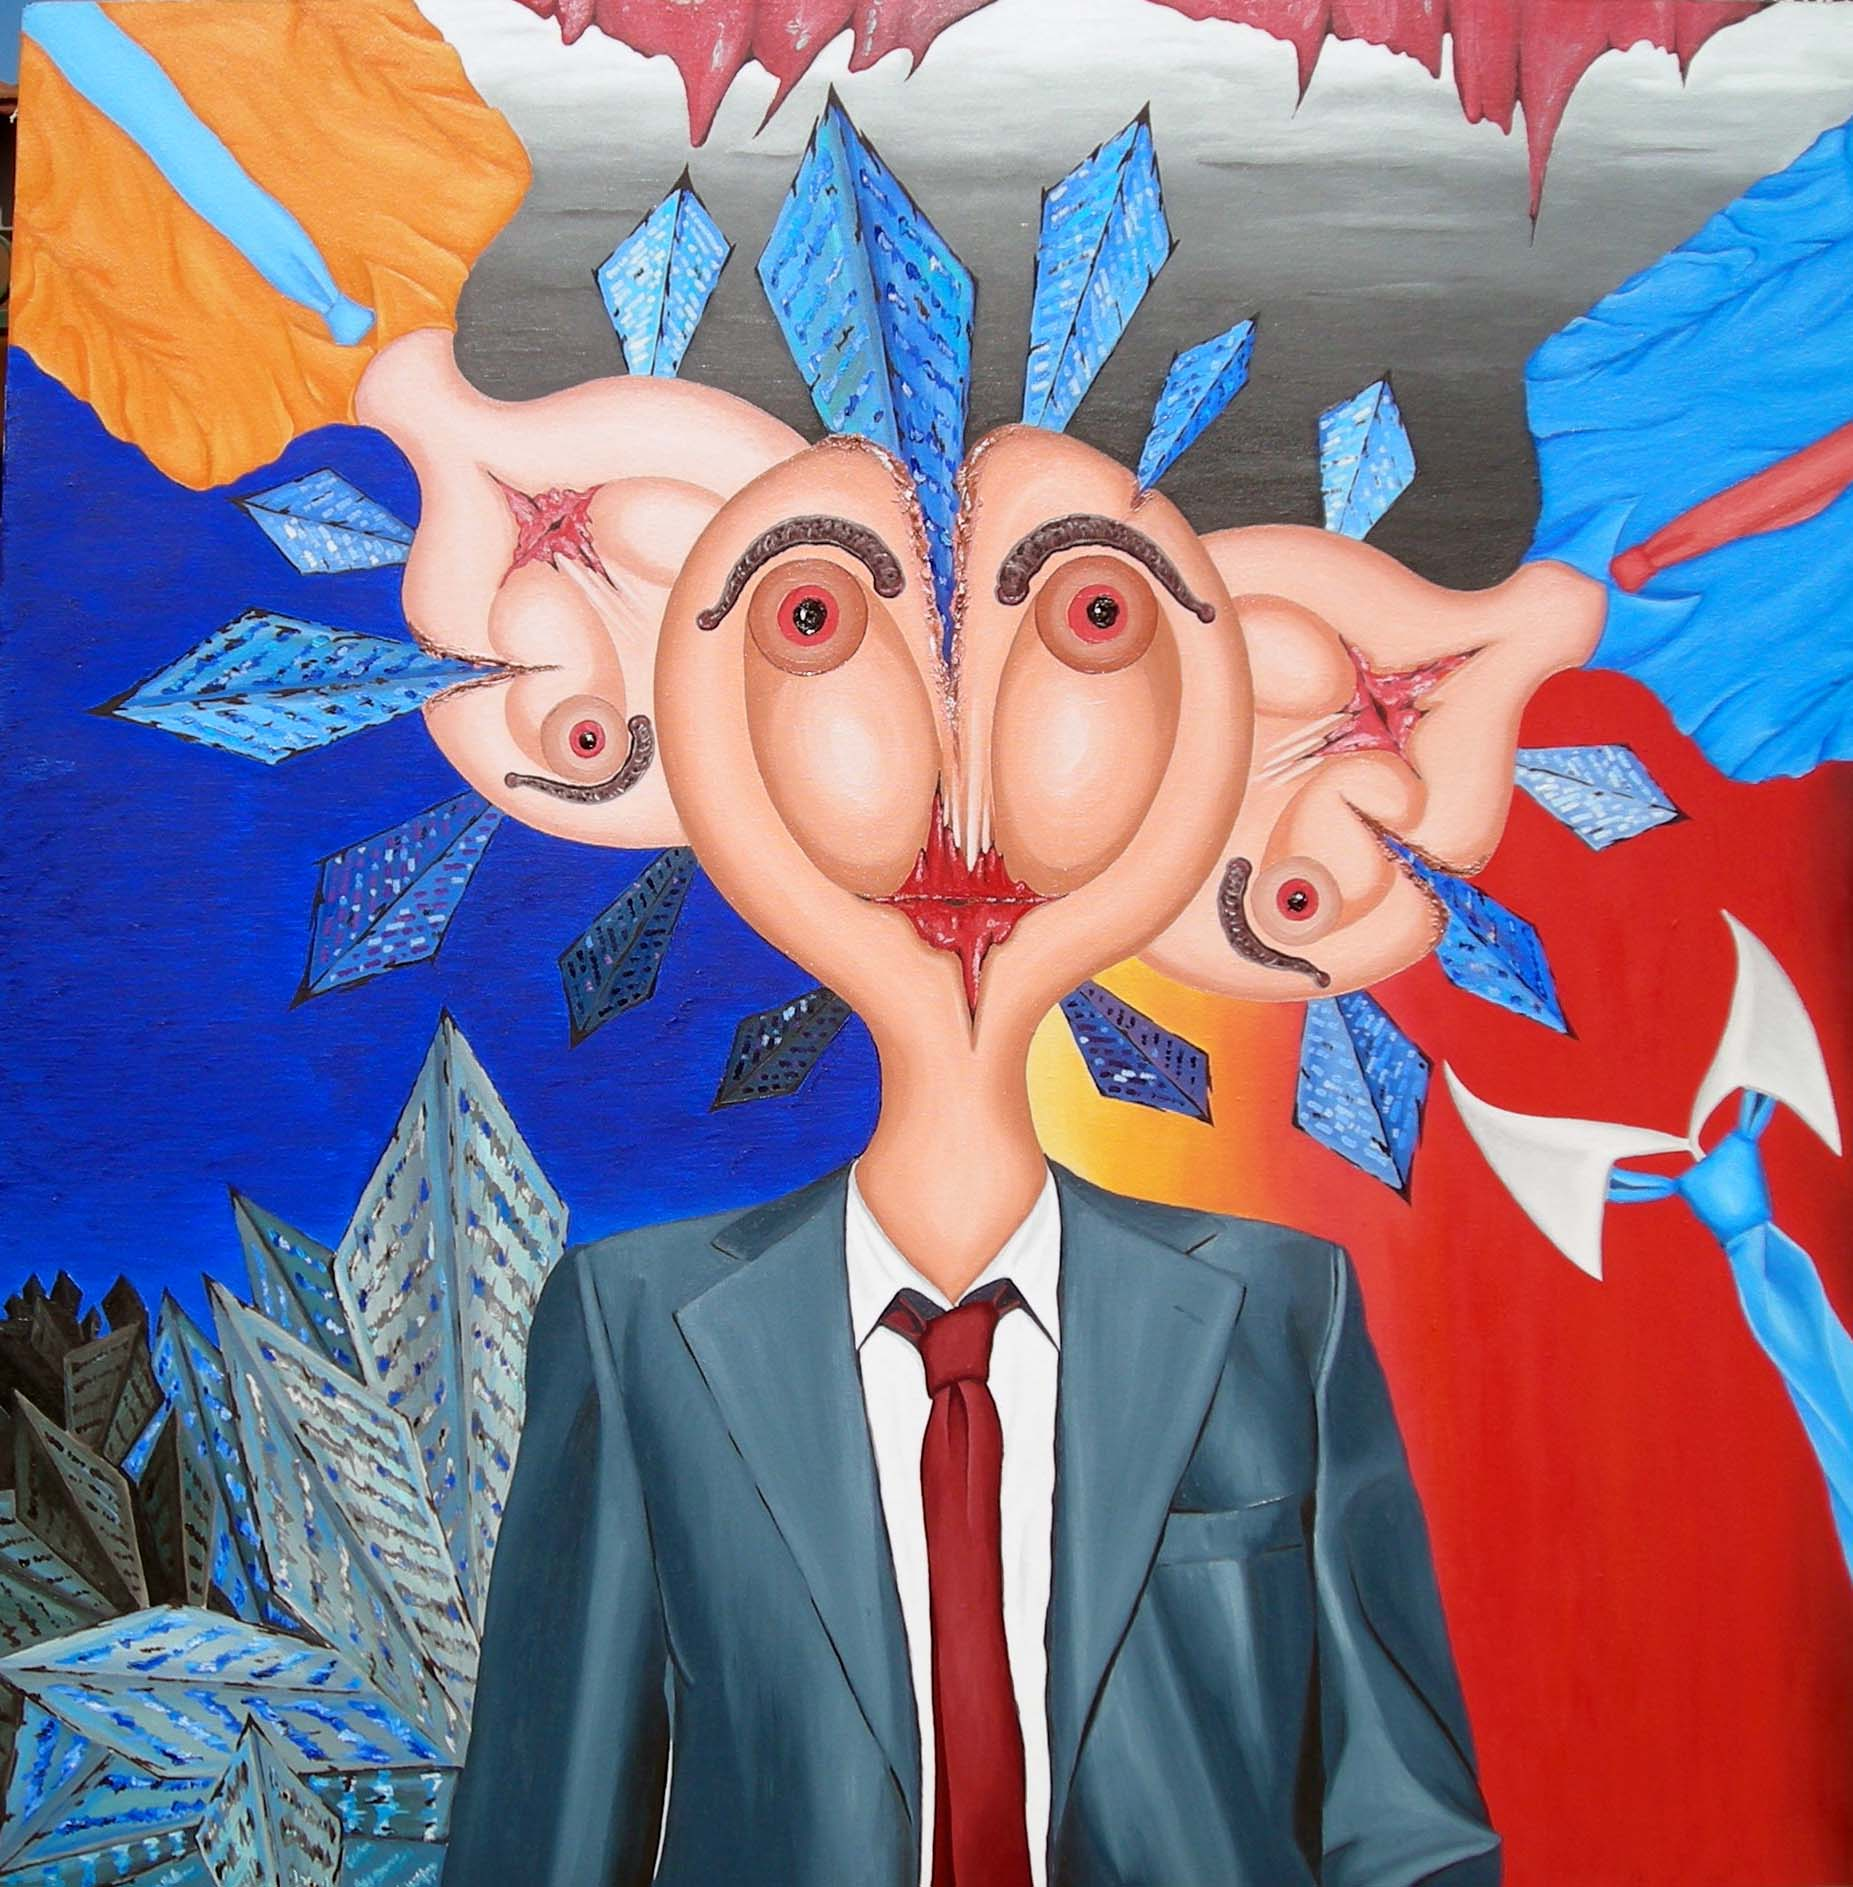 I tre rappresentanti, 2007 olio su tela, cm 100x100, Pasquale Mastrogiacomo.